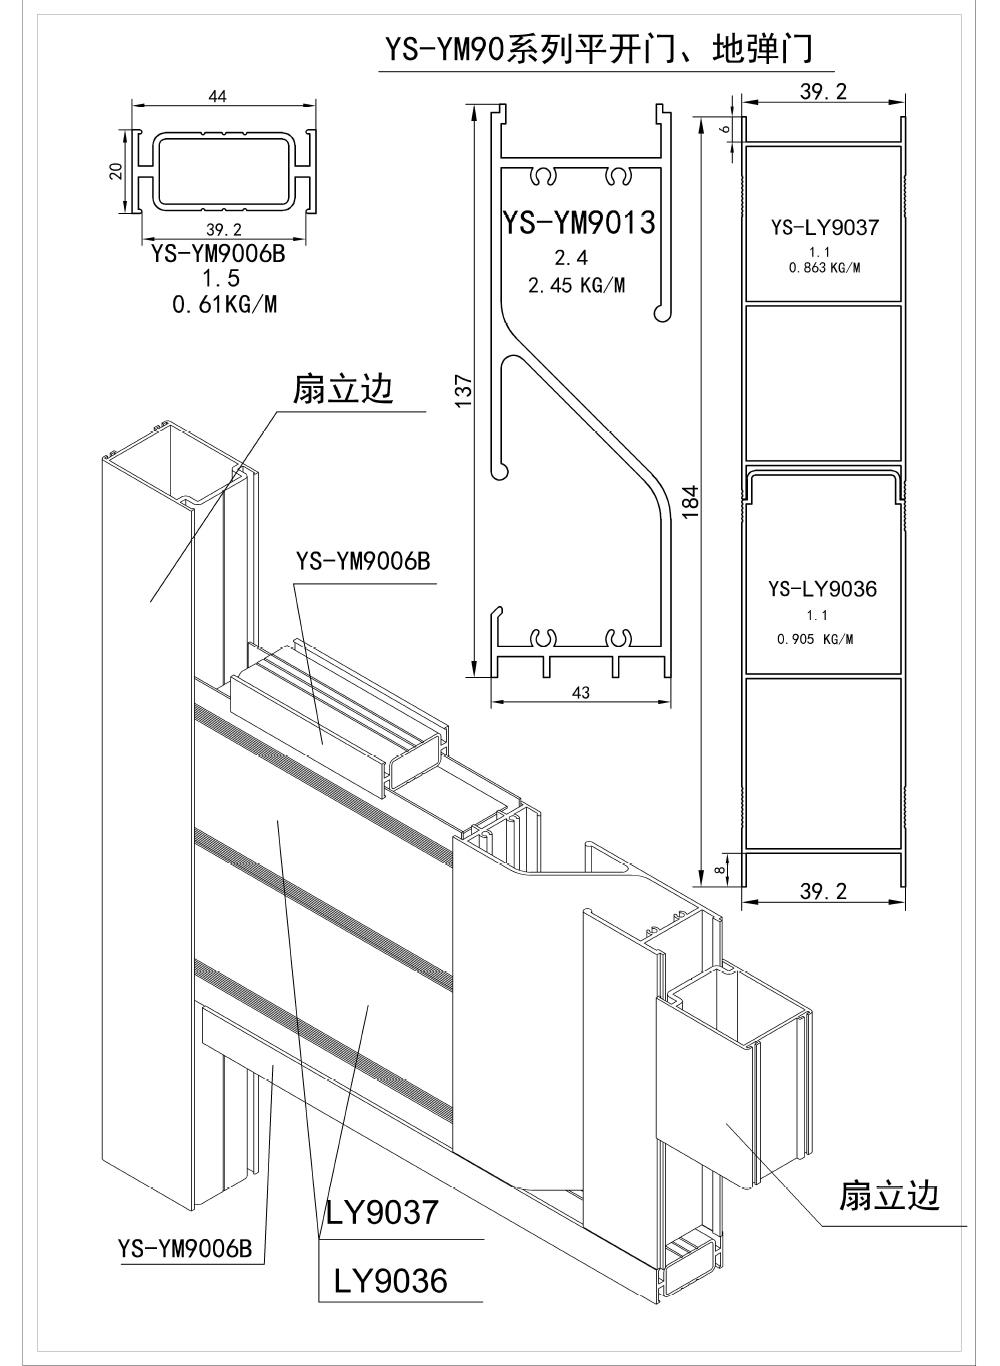 906--S44.4--BH1.9;2.8---------- YS-YM90系列平开门、地弹门